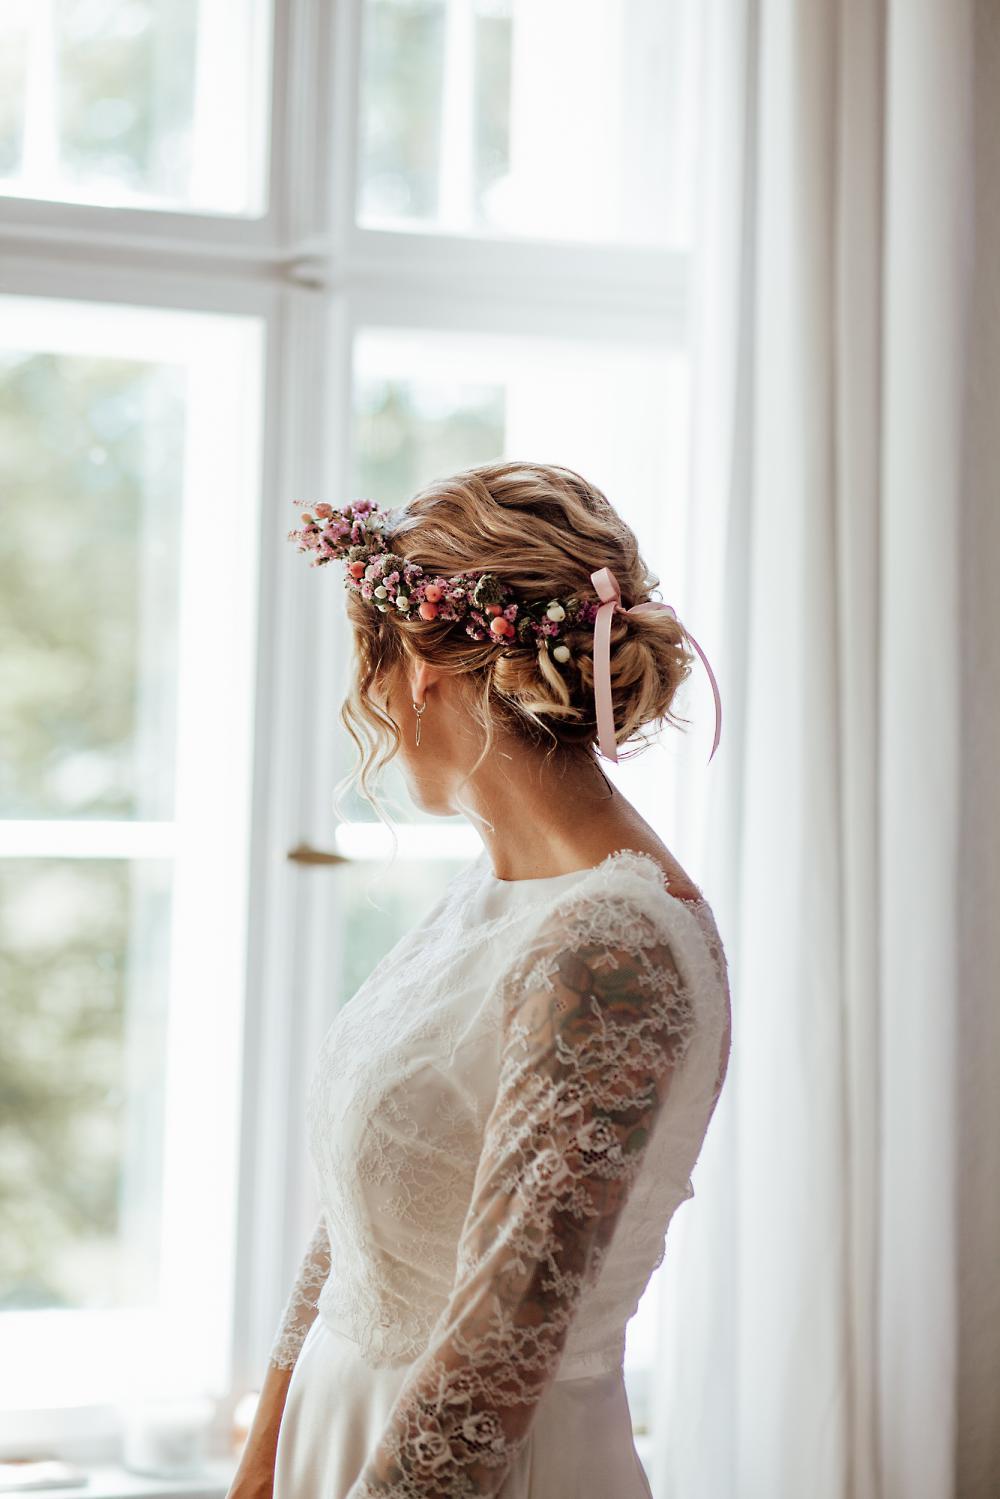 komorebi-Hochzeitsfotograf-6944_WEB.jpg